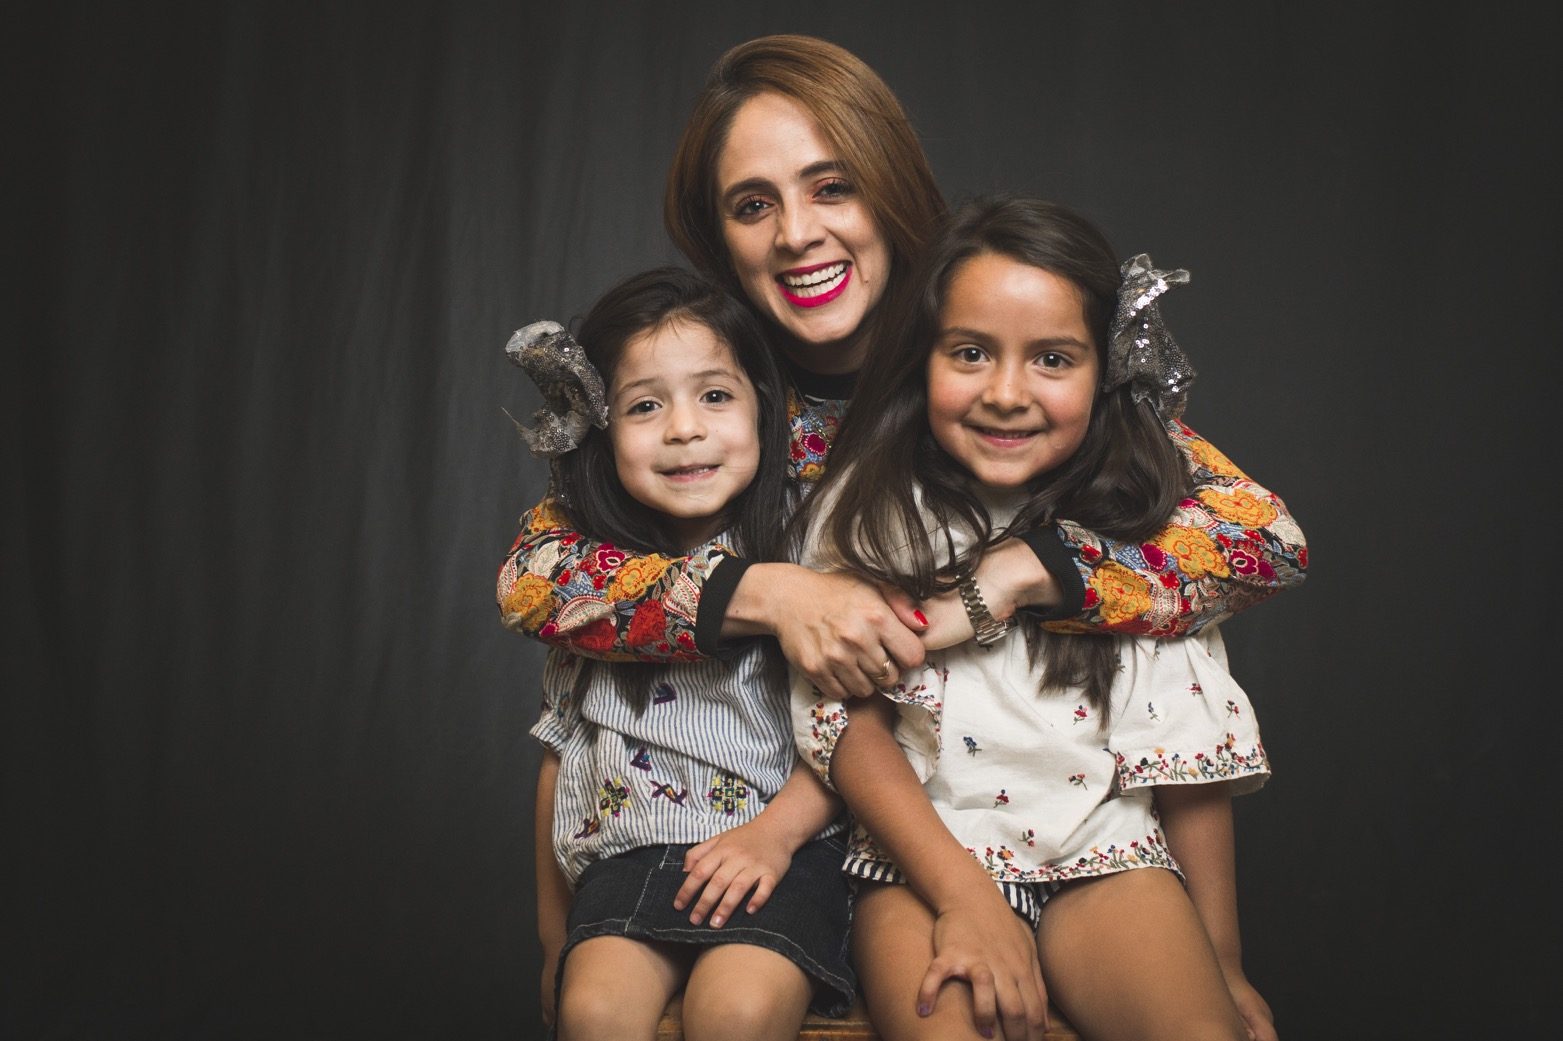 fotografo_zacatecas_casual_familia_bodas-17